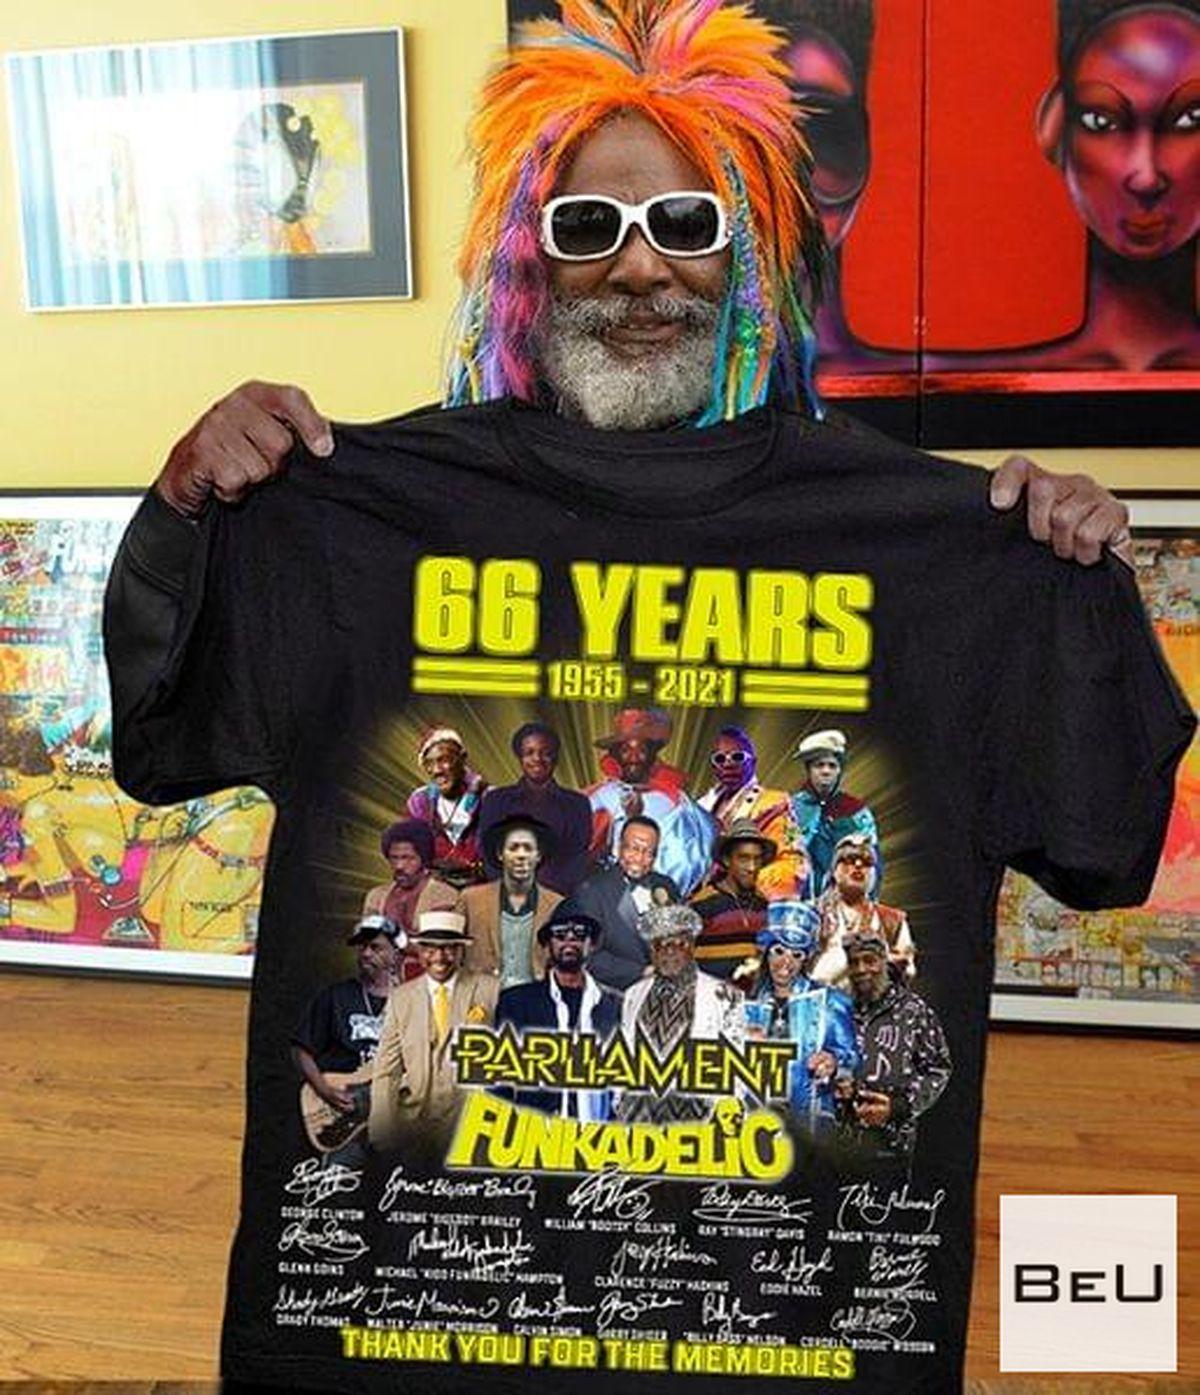 66 Years Parliament Funkadelic Thank You Shirt, hoodie, tank top